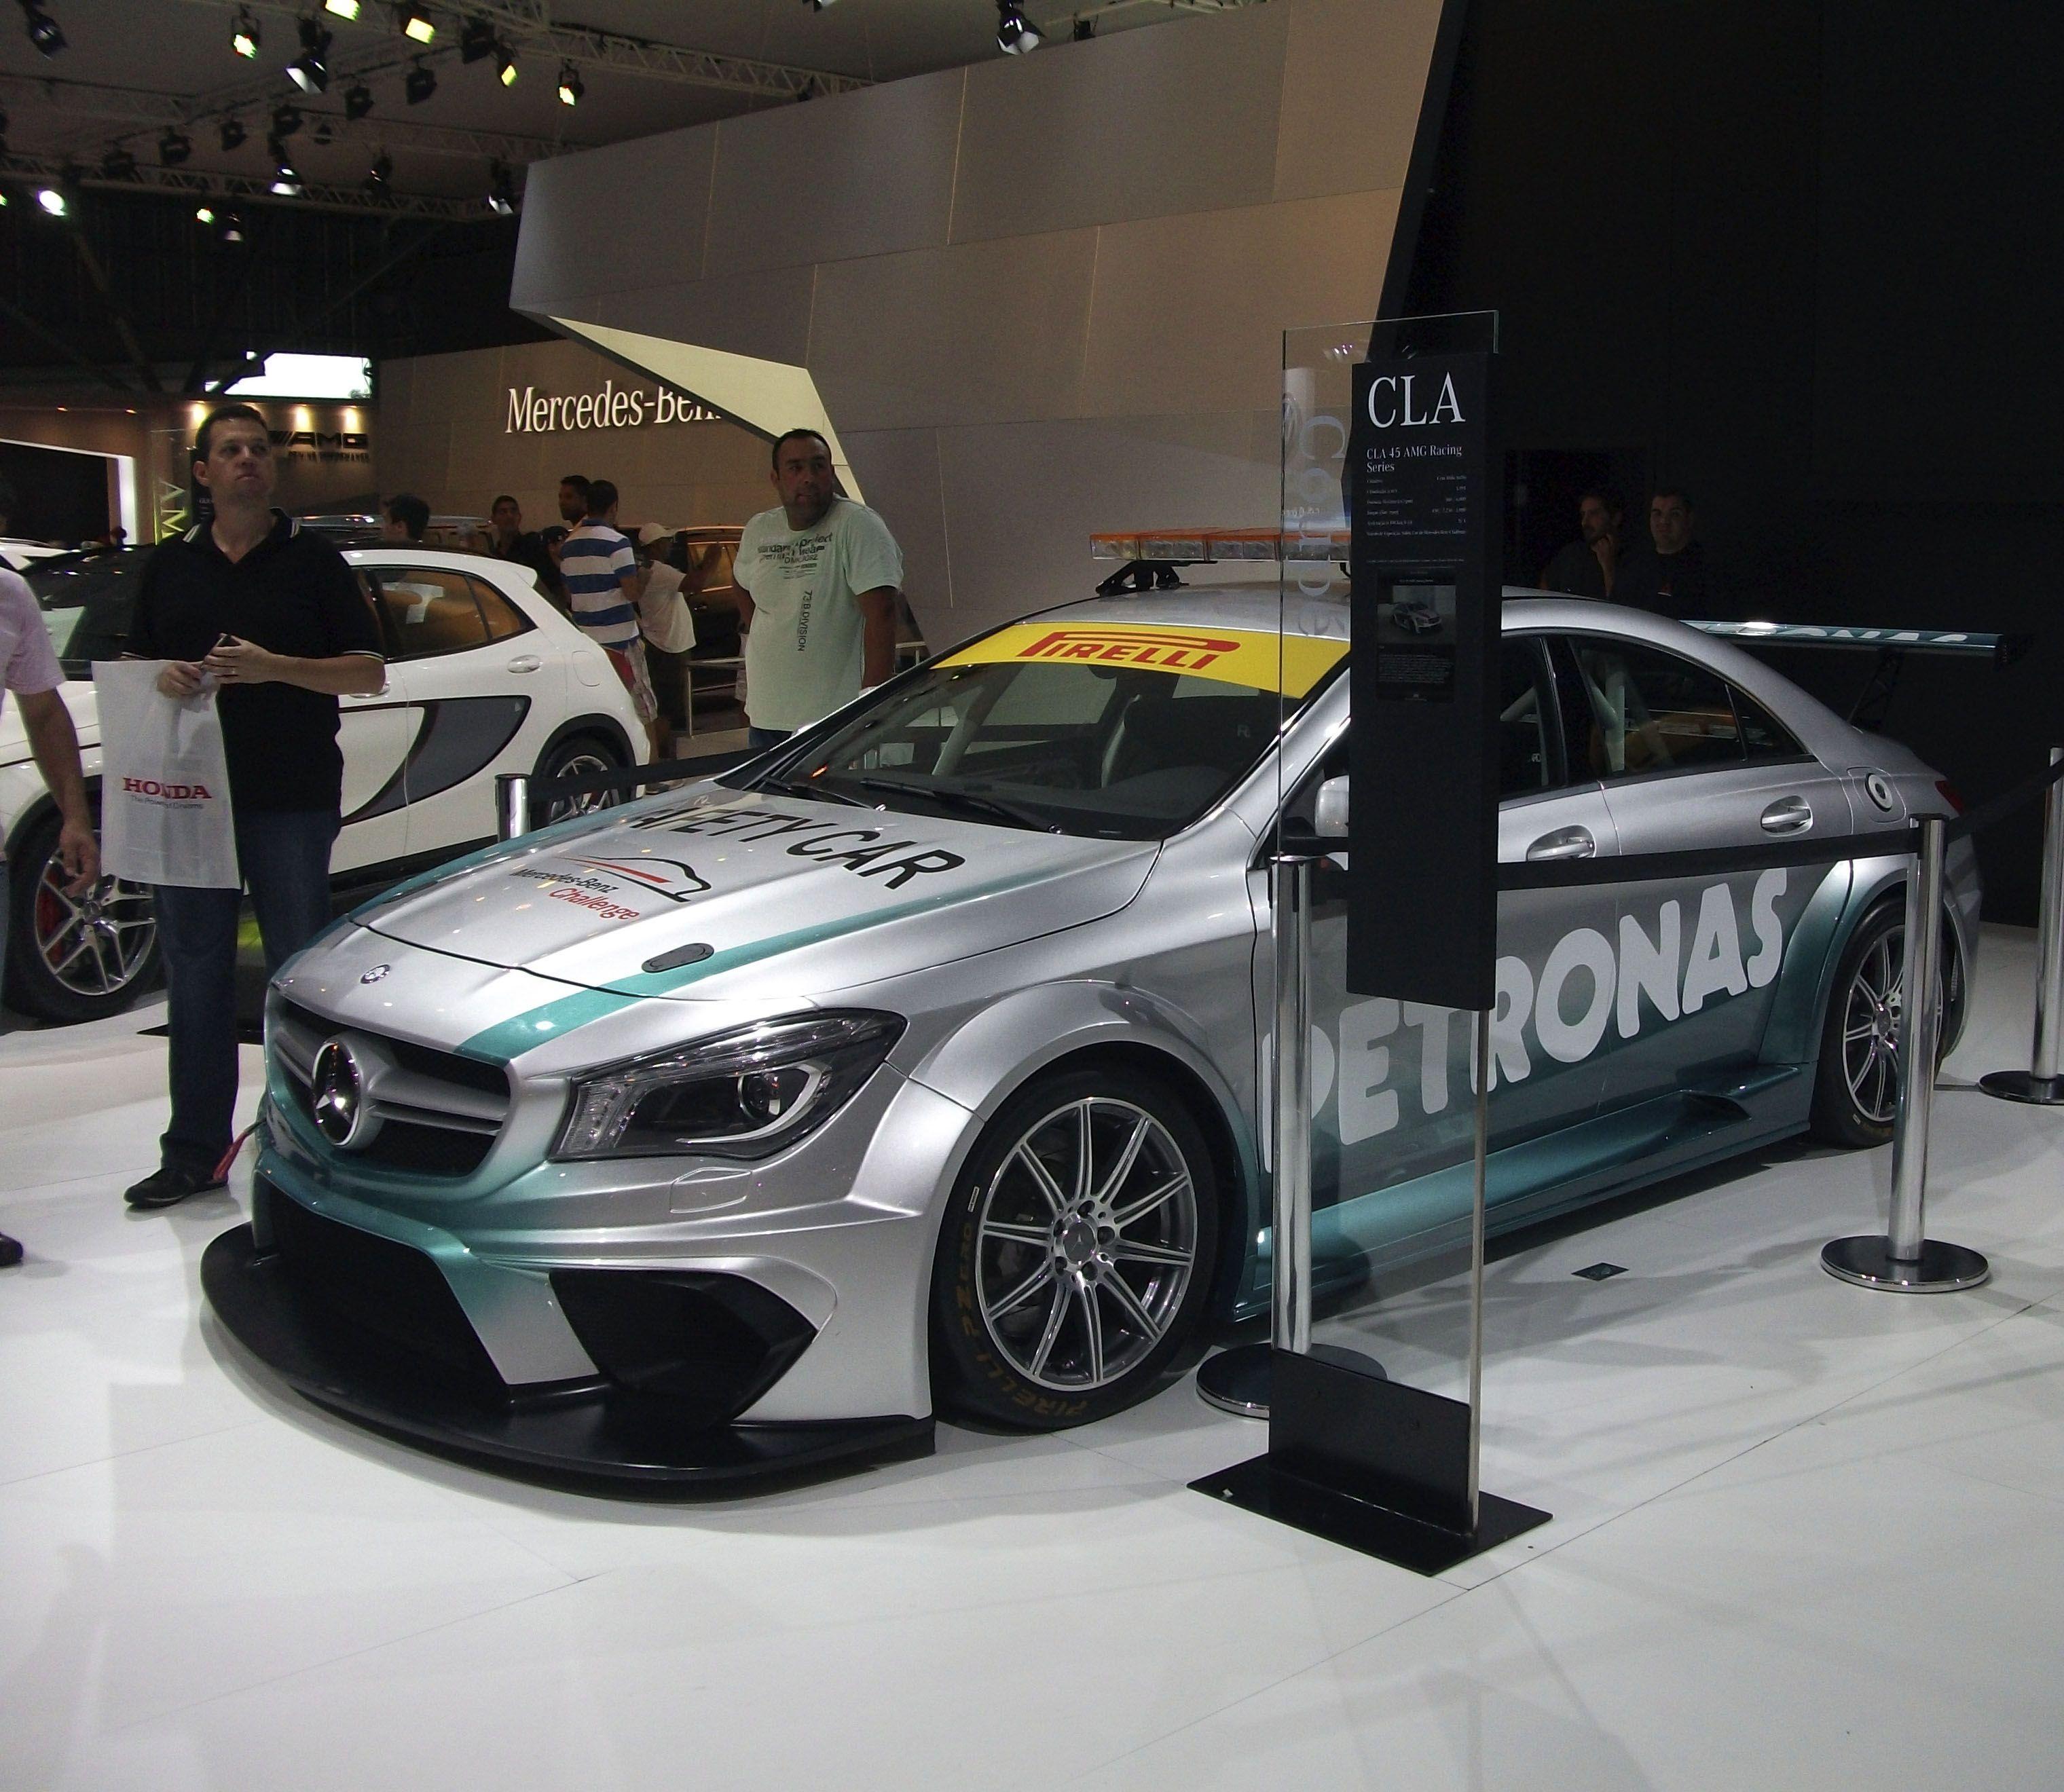 mercedes benz cla 45 amg racing series safety car da. Black Bedroom Furniture Sets. Home Design Ideas